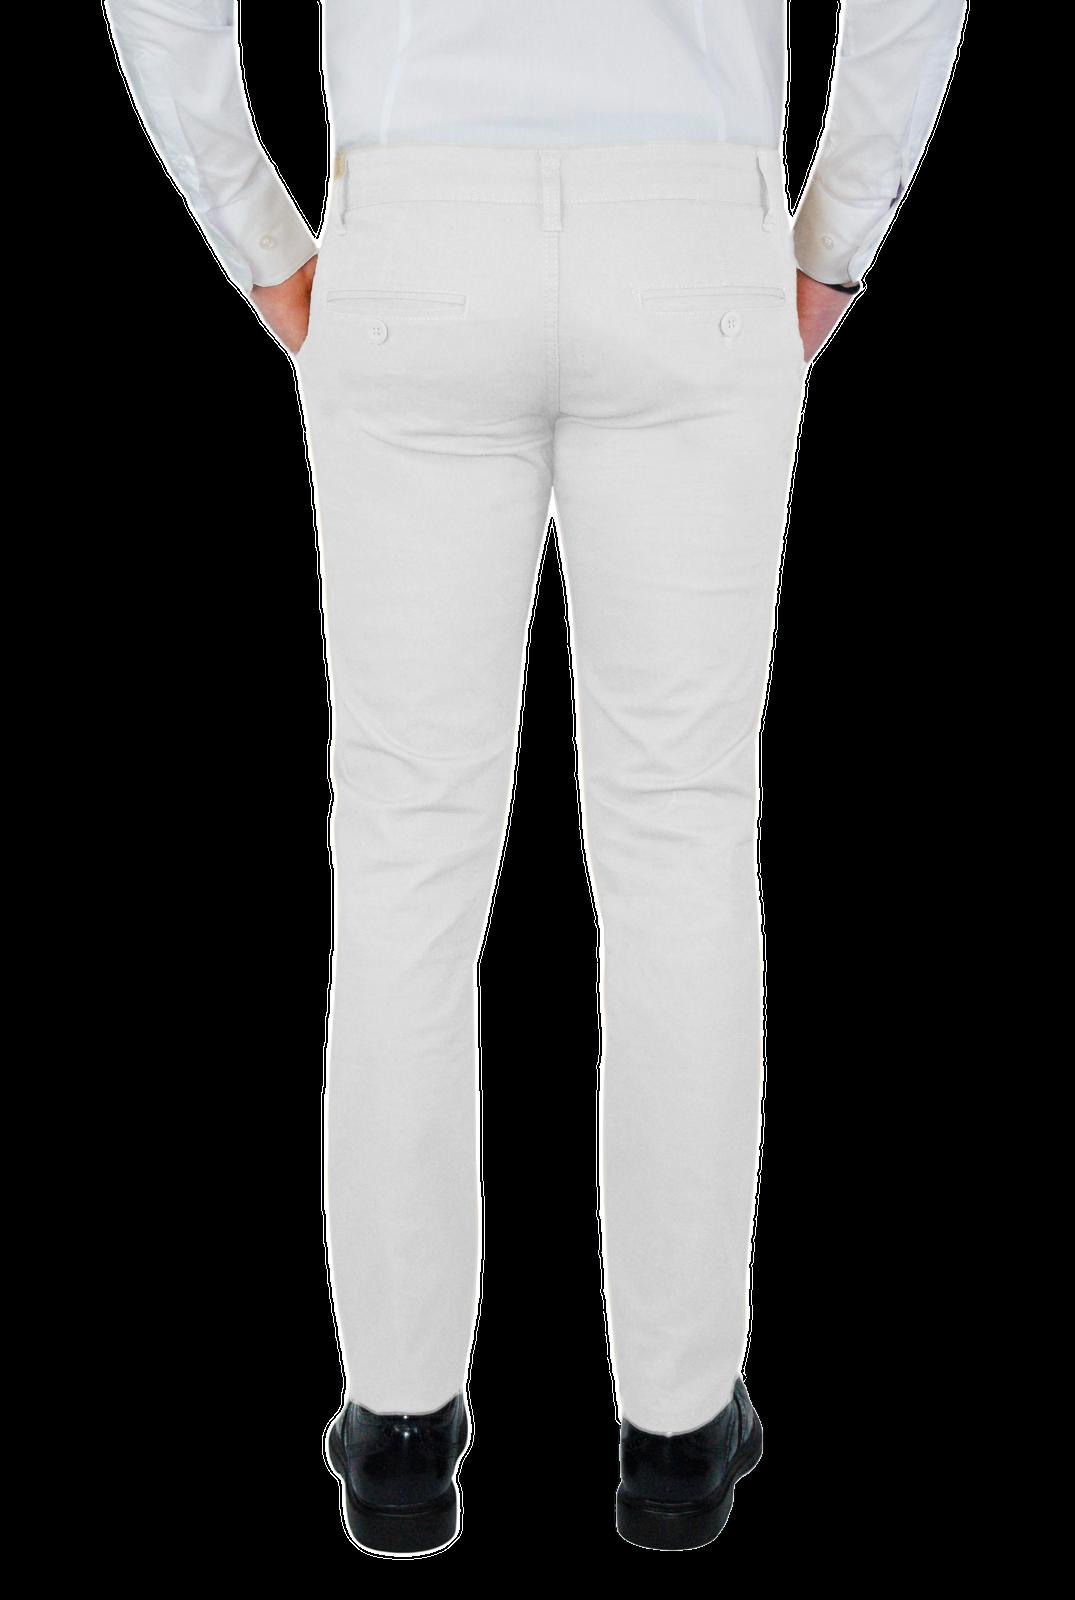 Pantalone-Uomo-Chino-Slim-fit-Primaverile-tasca-america-Bianco-Grigio-Senape-Bei miniatura 14